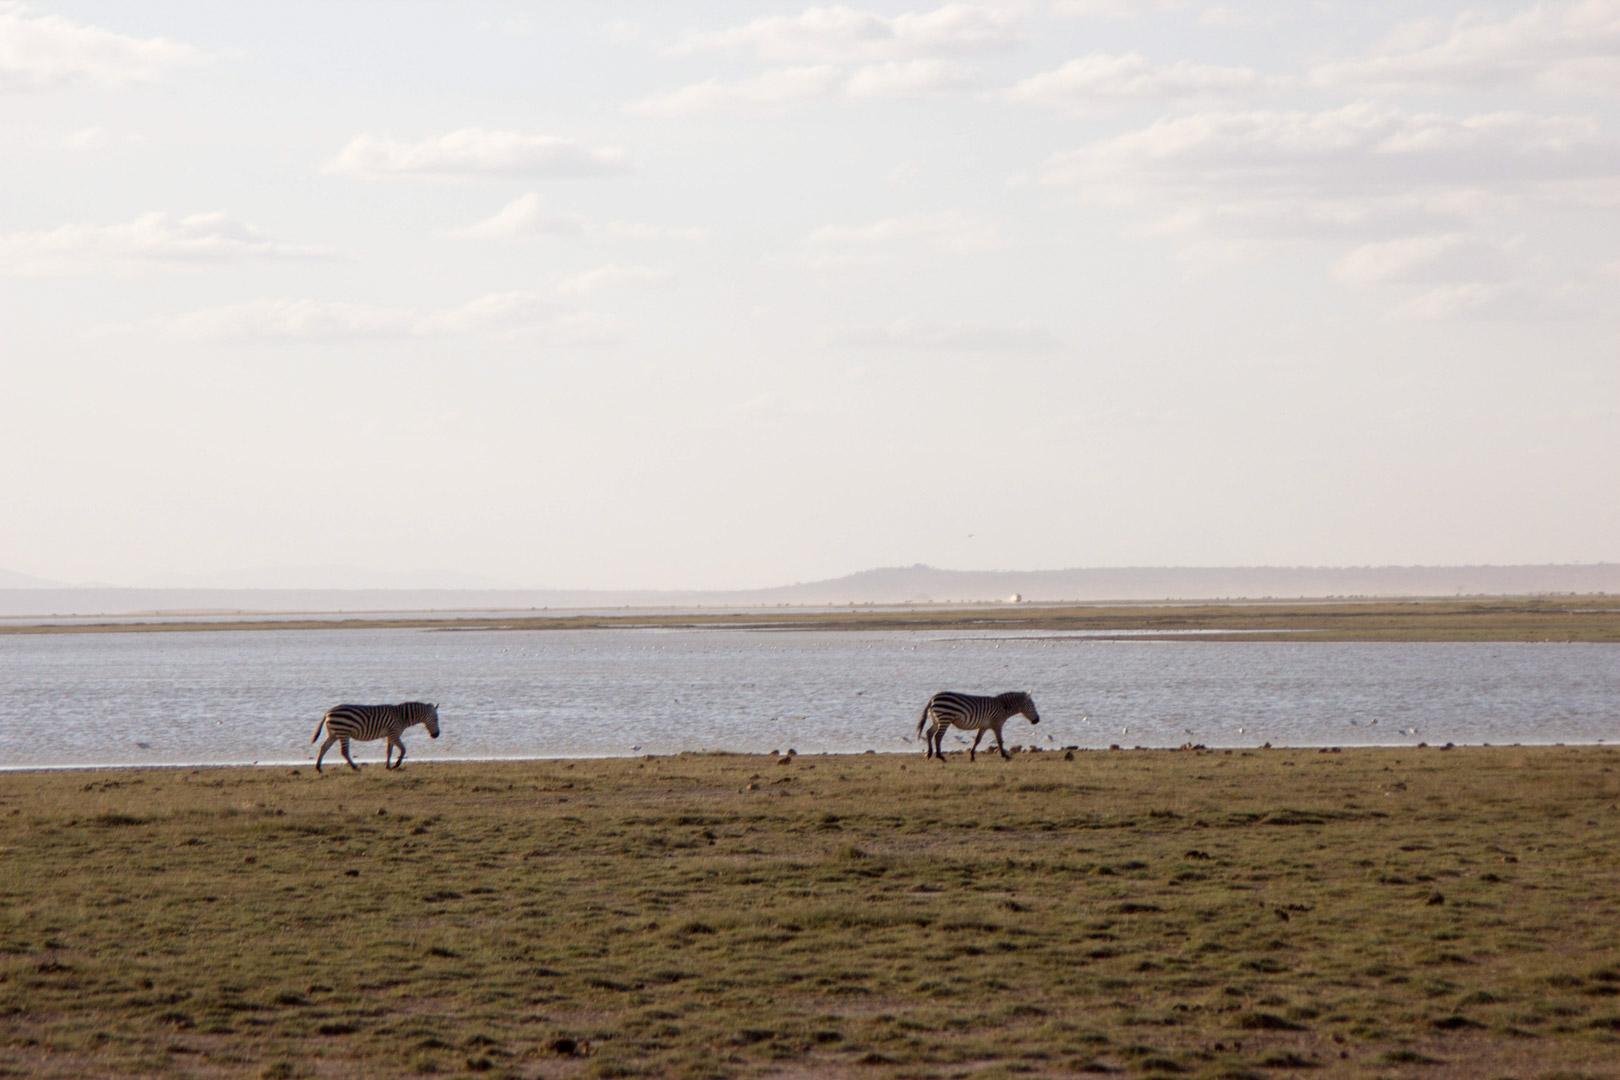 Cebras, Parque Nacional de Amboseli, Kenia